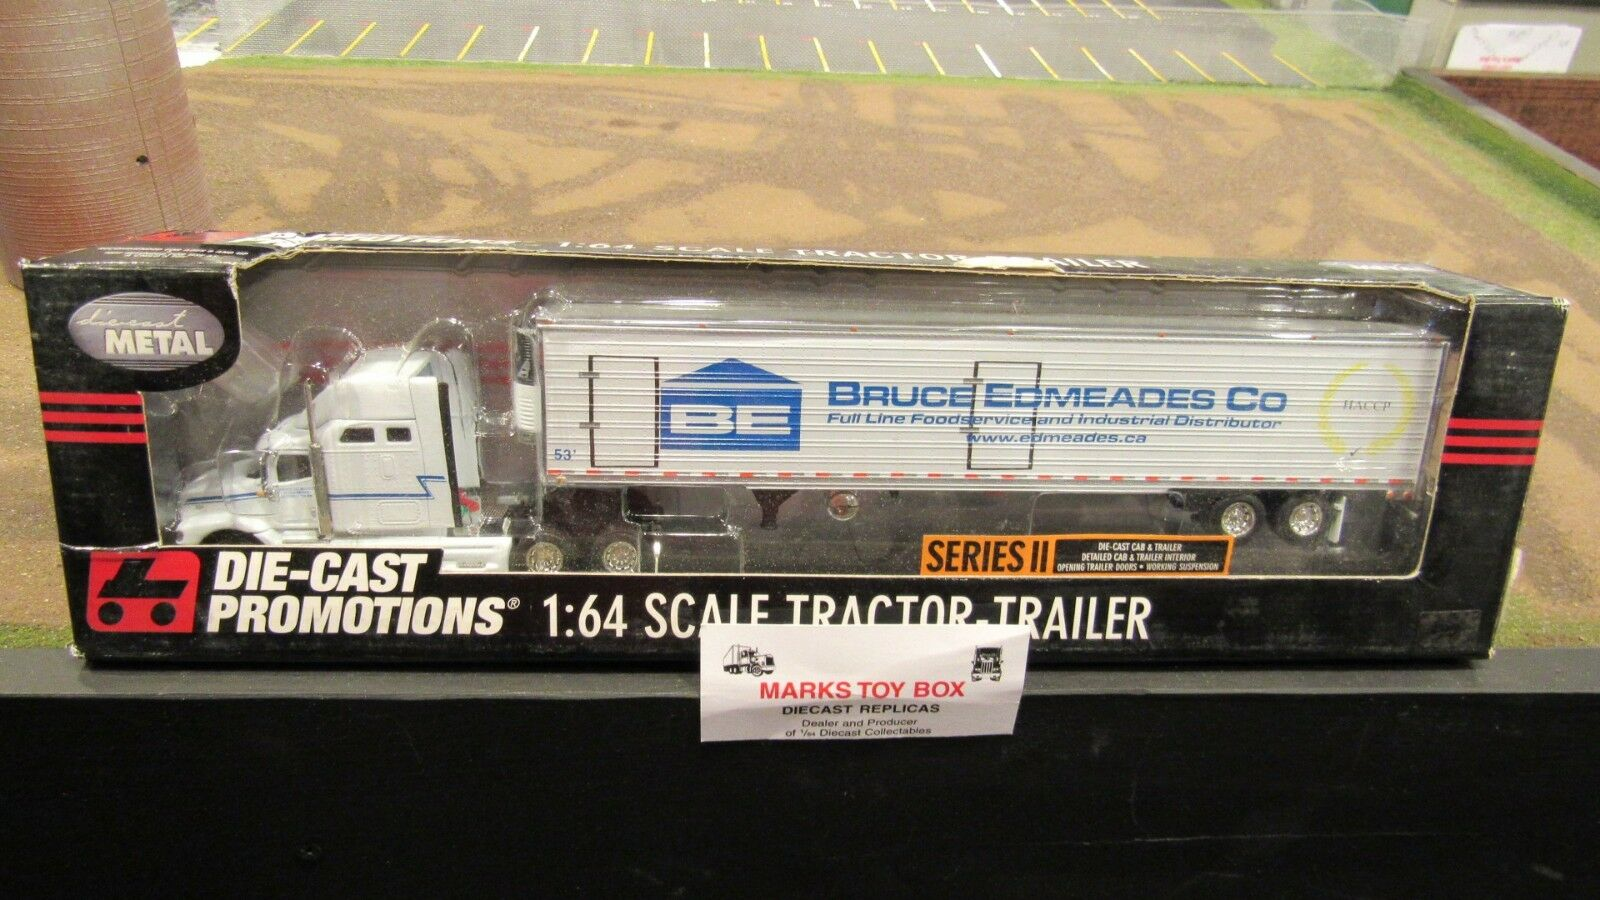 DCPB Bruce edmeades Co ih 9400 Semi CAB camioneta Reefer Van Trailer 1 64 FC